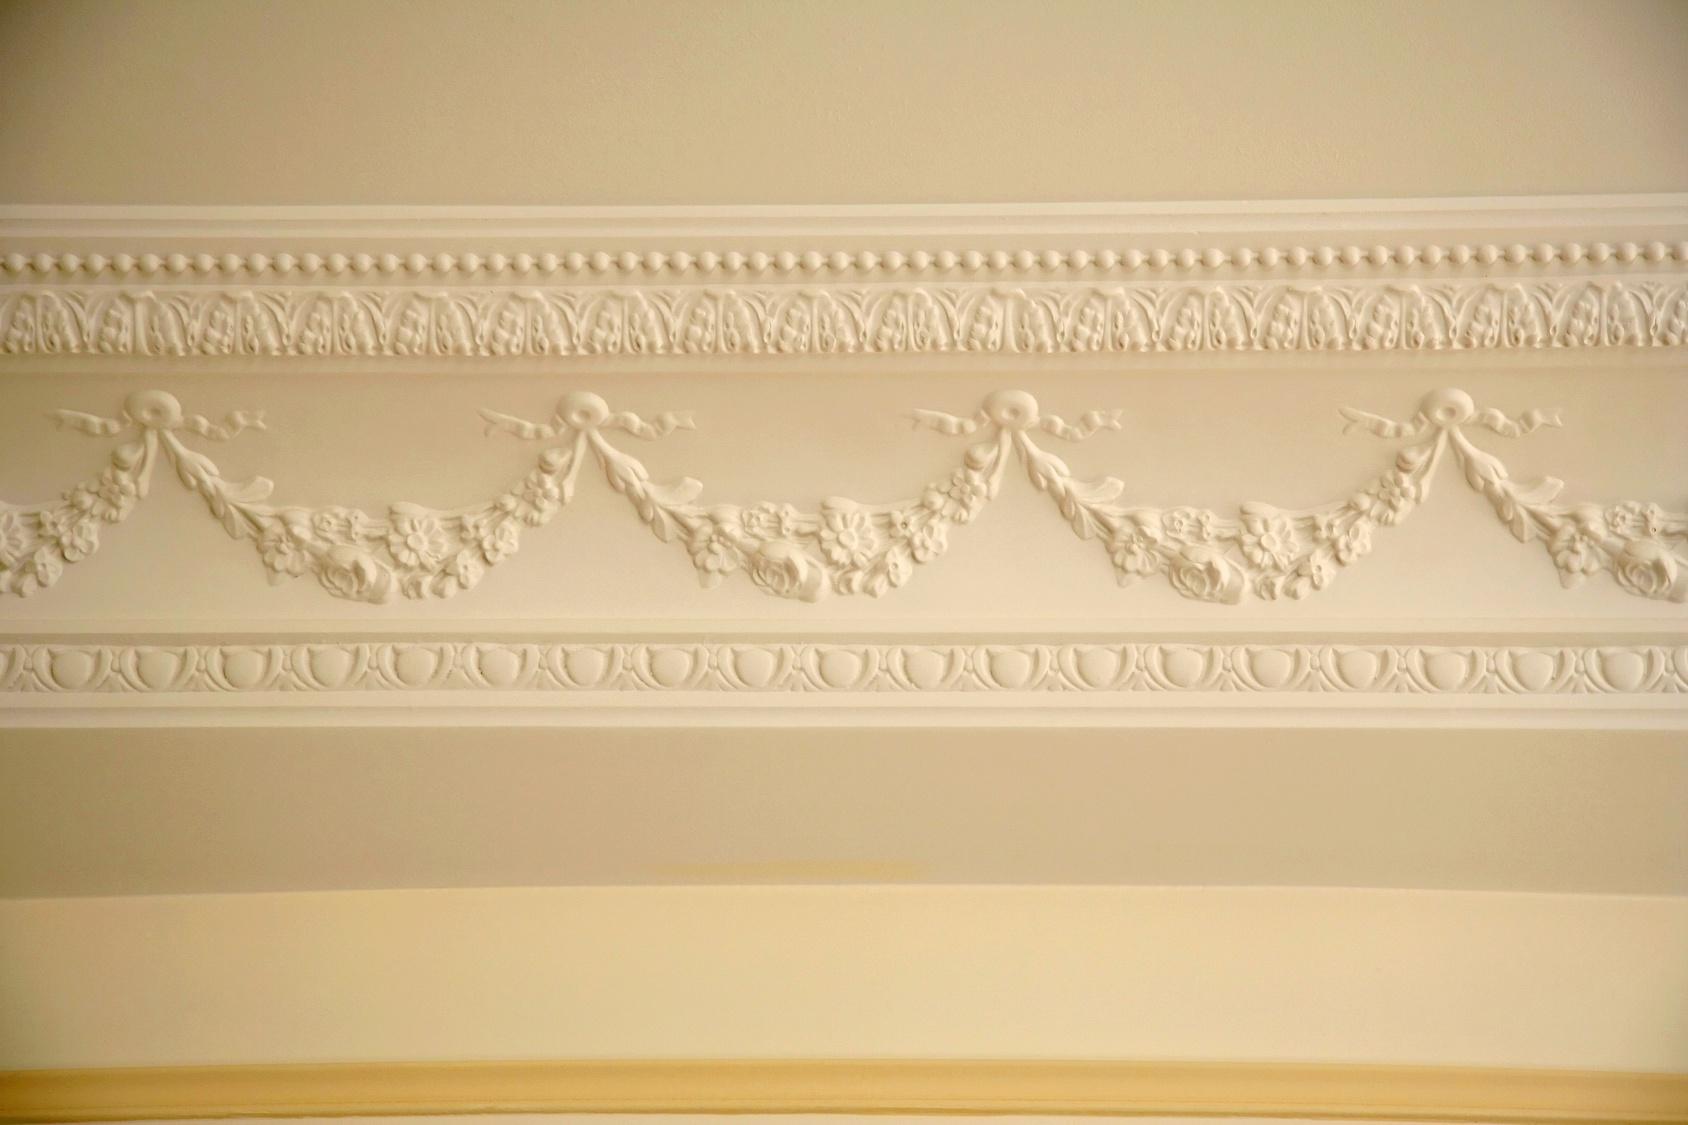 Плинтус на потолок полиуретановый